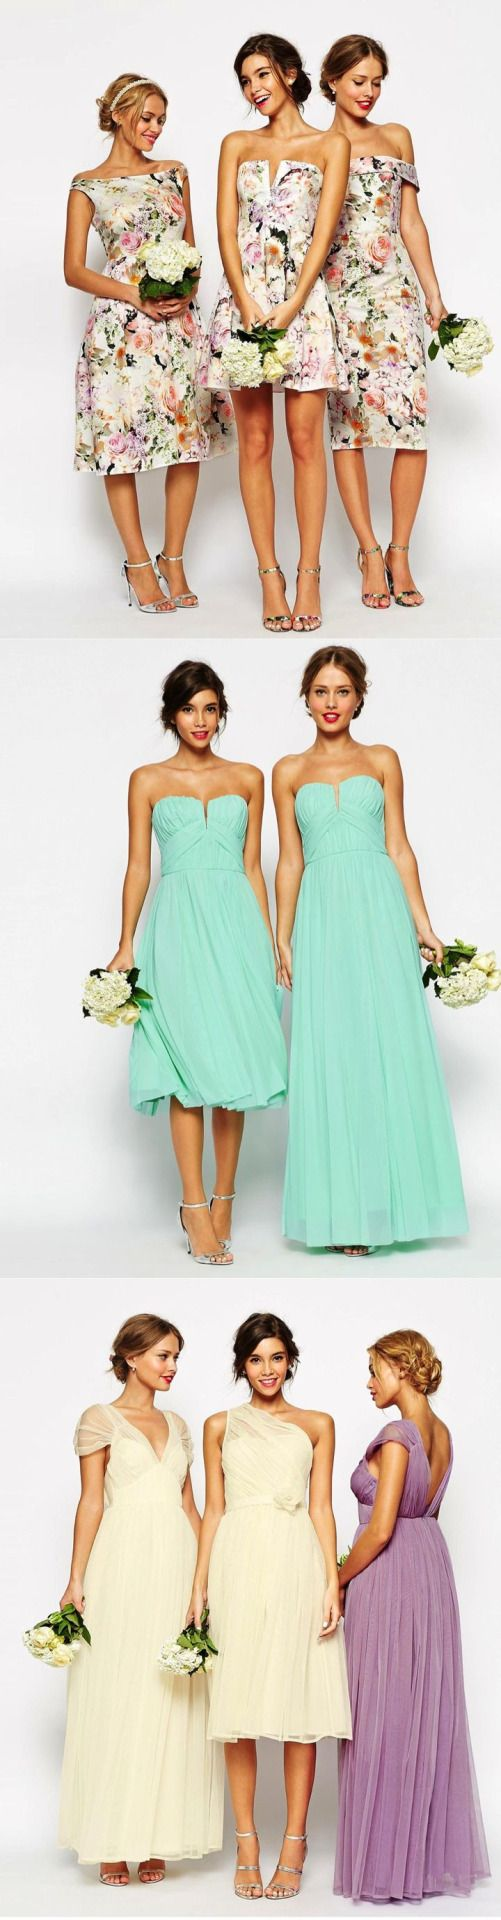 You bridesmaids will look so beautiful